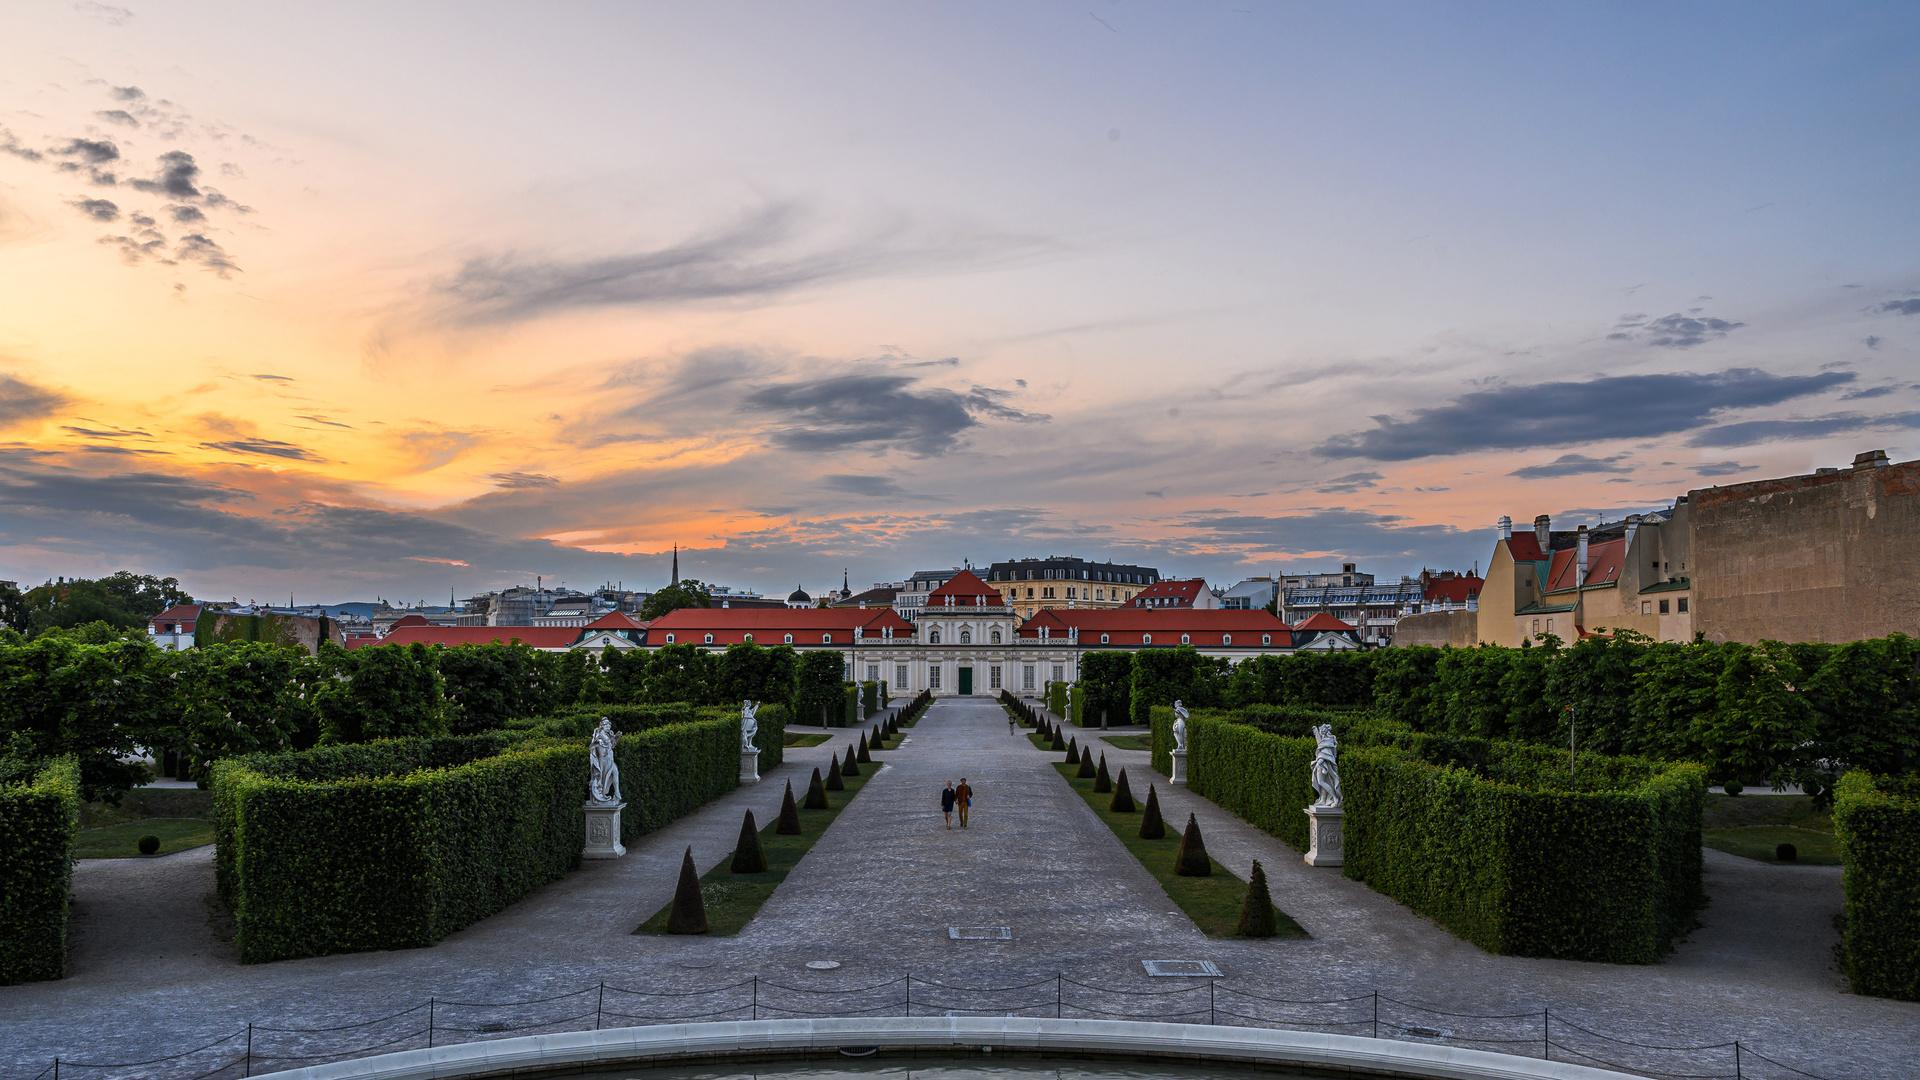 австрия, вена, вечер, ландшафтный дизайн, скульптуры, belvedere, дворец, кусты, город